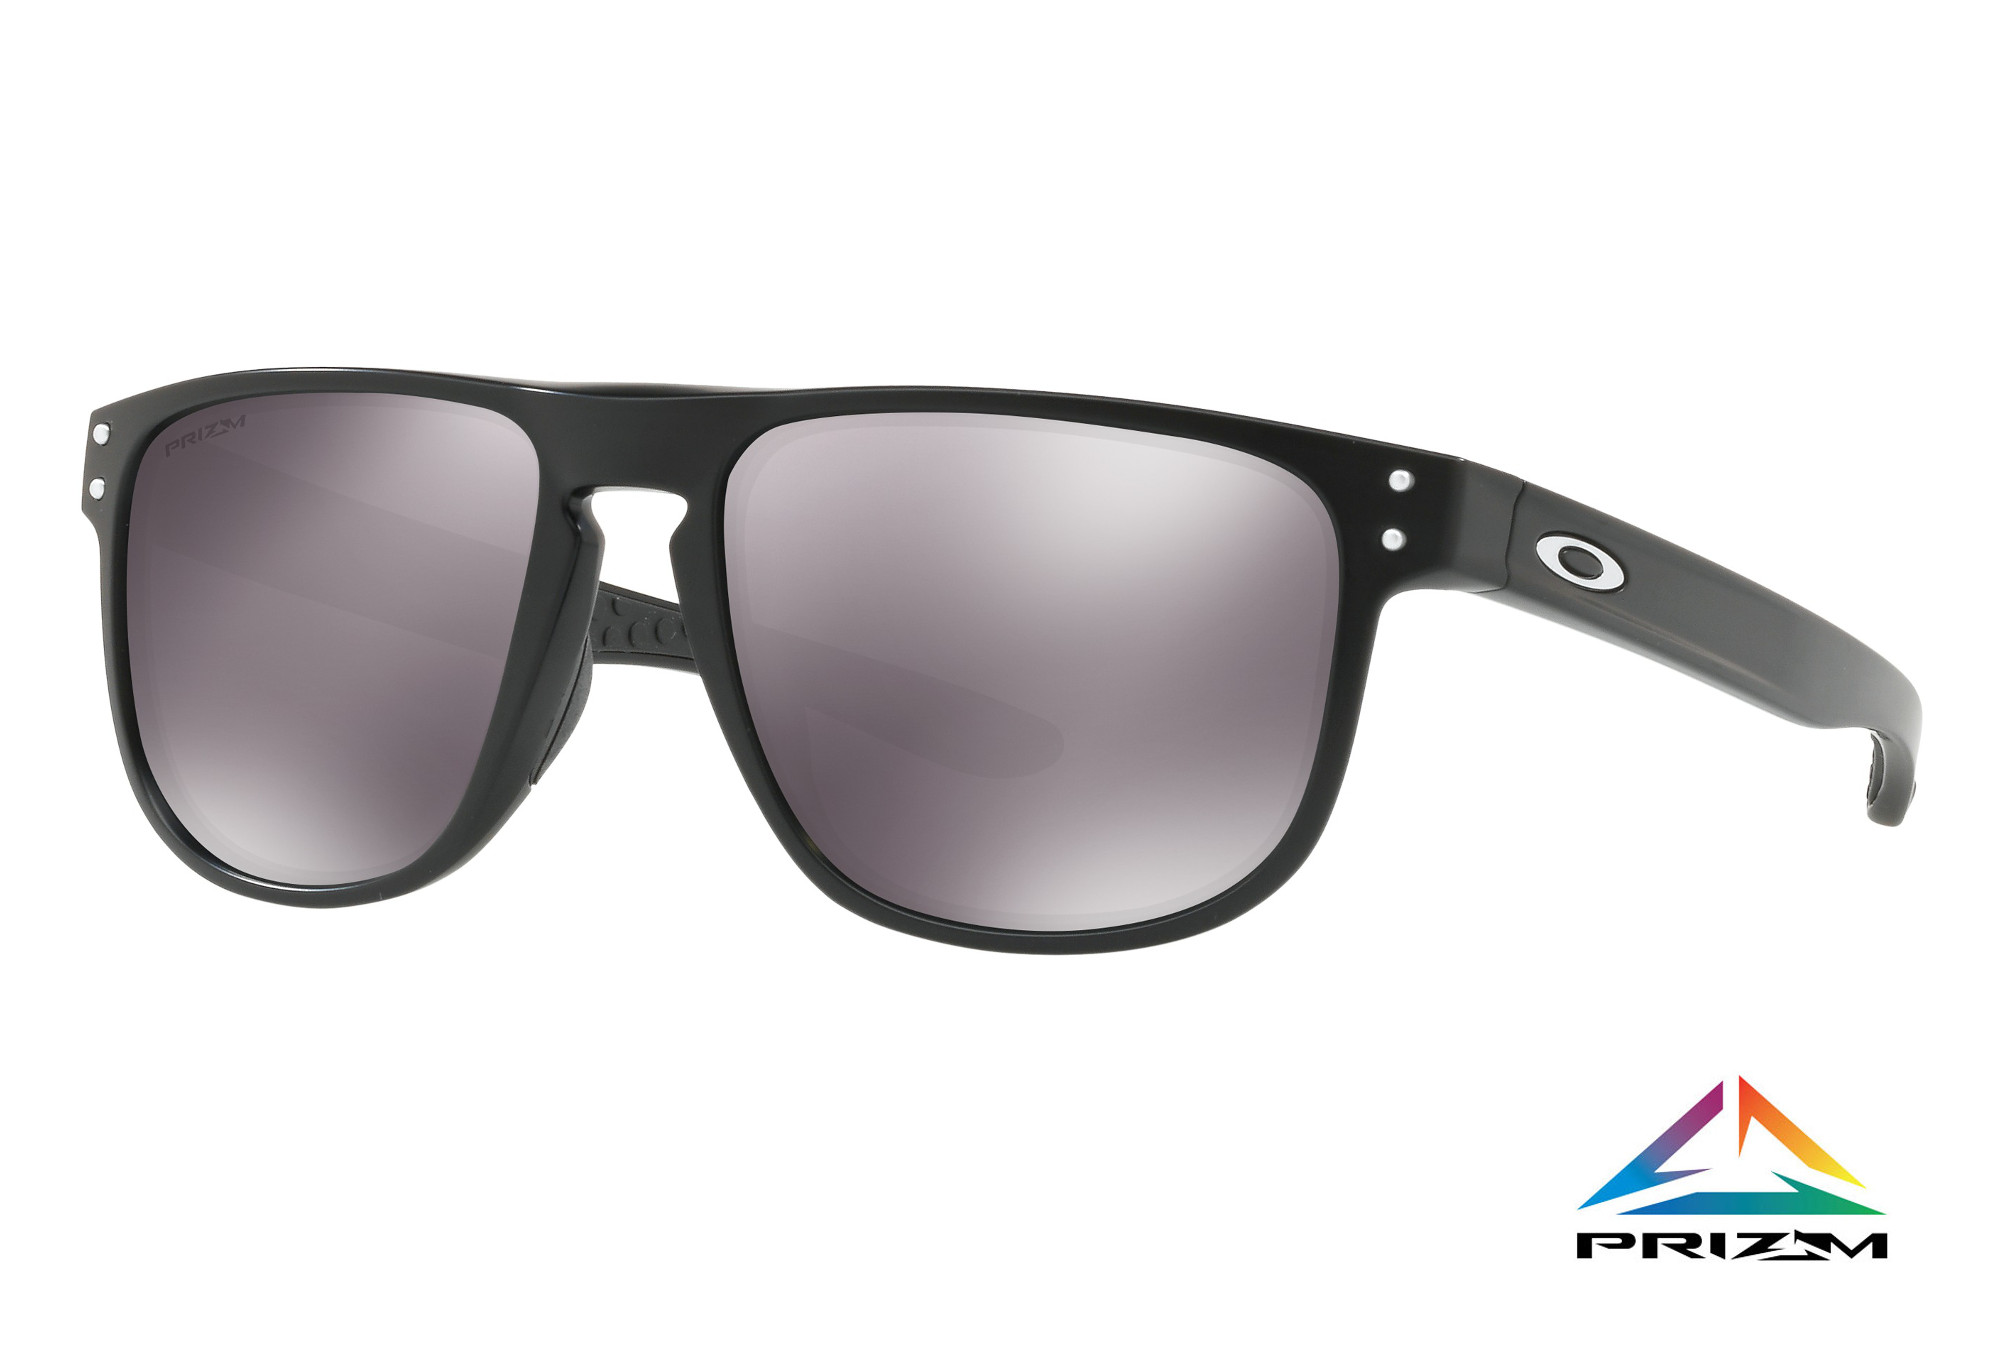 6be0f75d86 OAKLEY Sunglasses Holbrook R Matte Black Prizm Black Ref  OO9377-0255